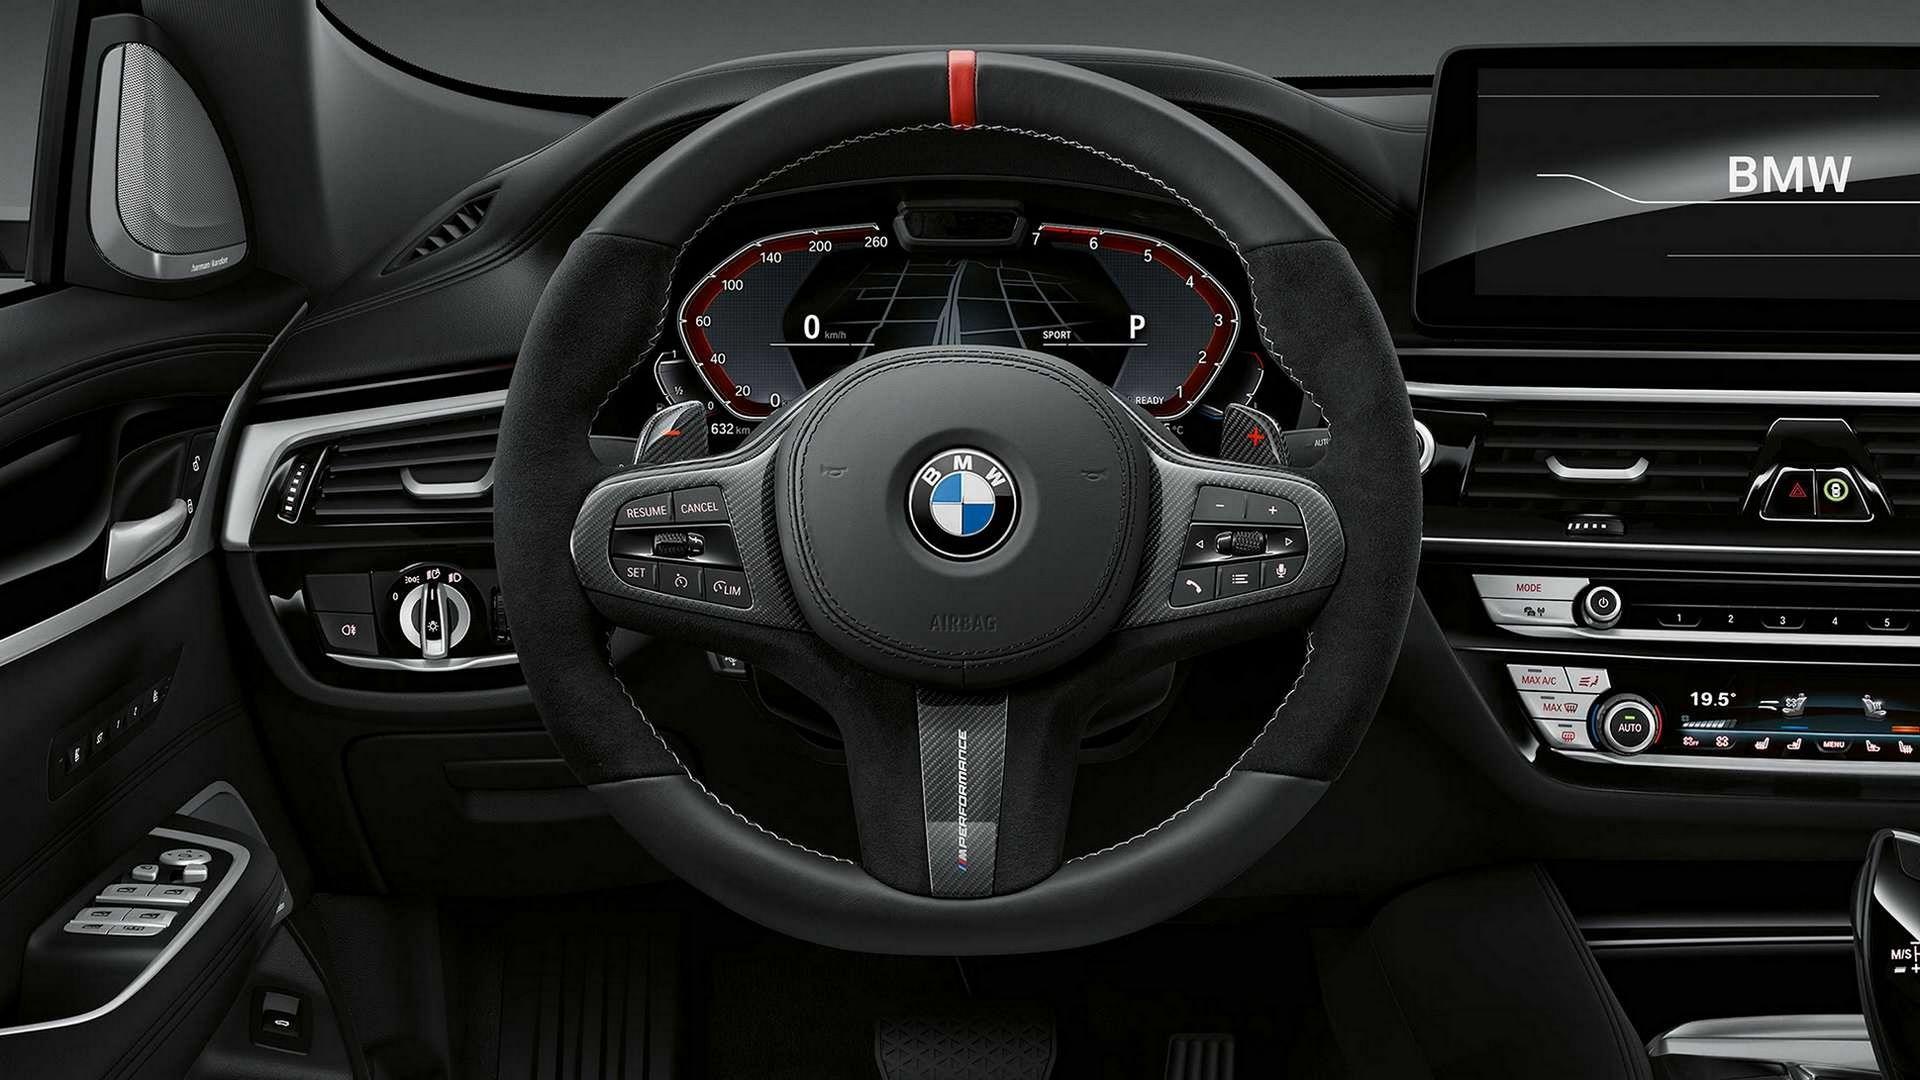 BMW-6-Series-GT-Gran-Turismo-facelift-2021-48